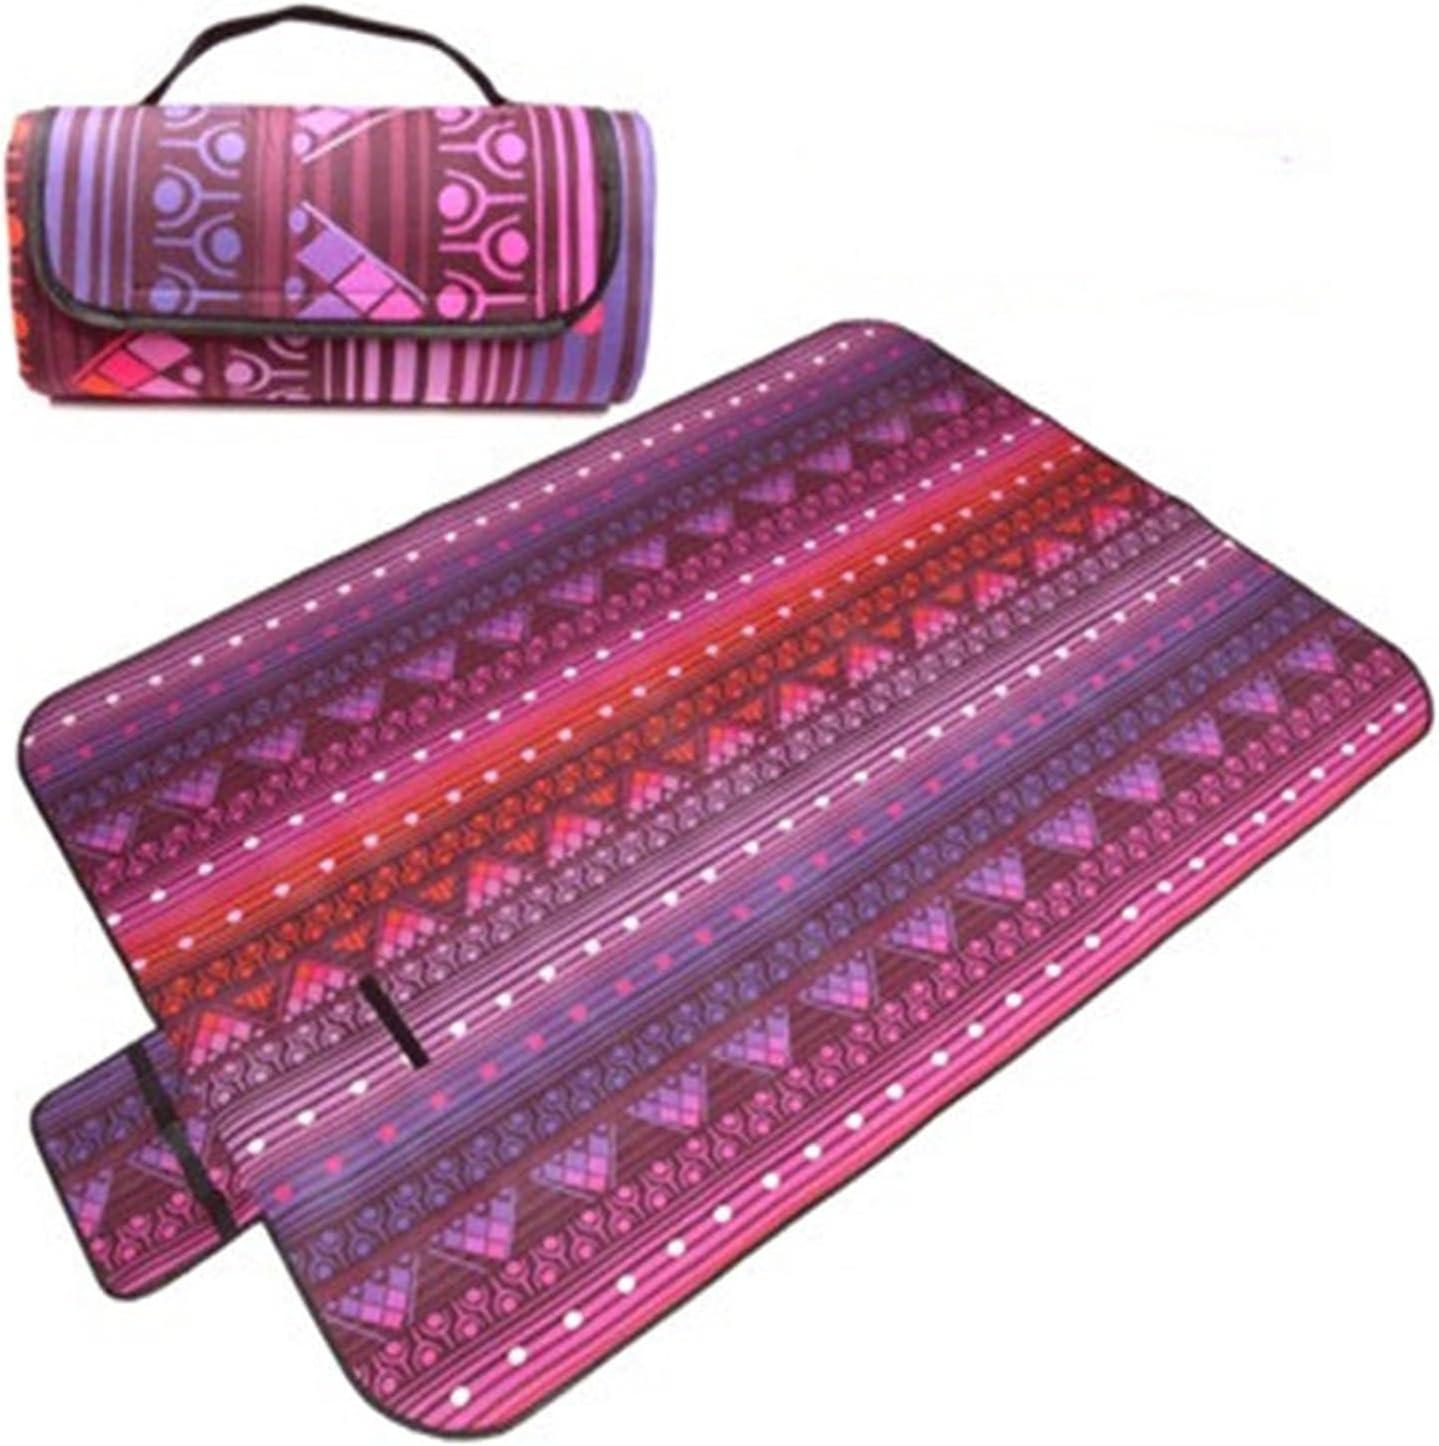 yangmeng Latest item 4 Sizes Price reduction of Retro Printed Outdoor Mats Picnic Folding B